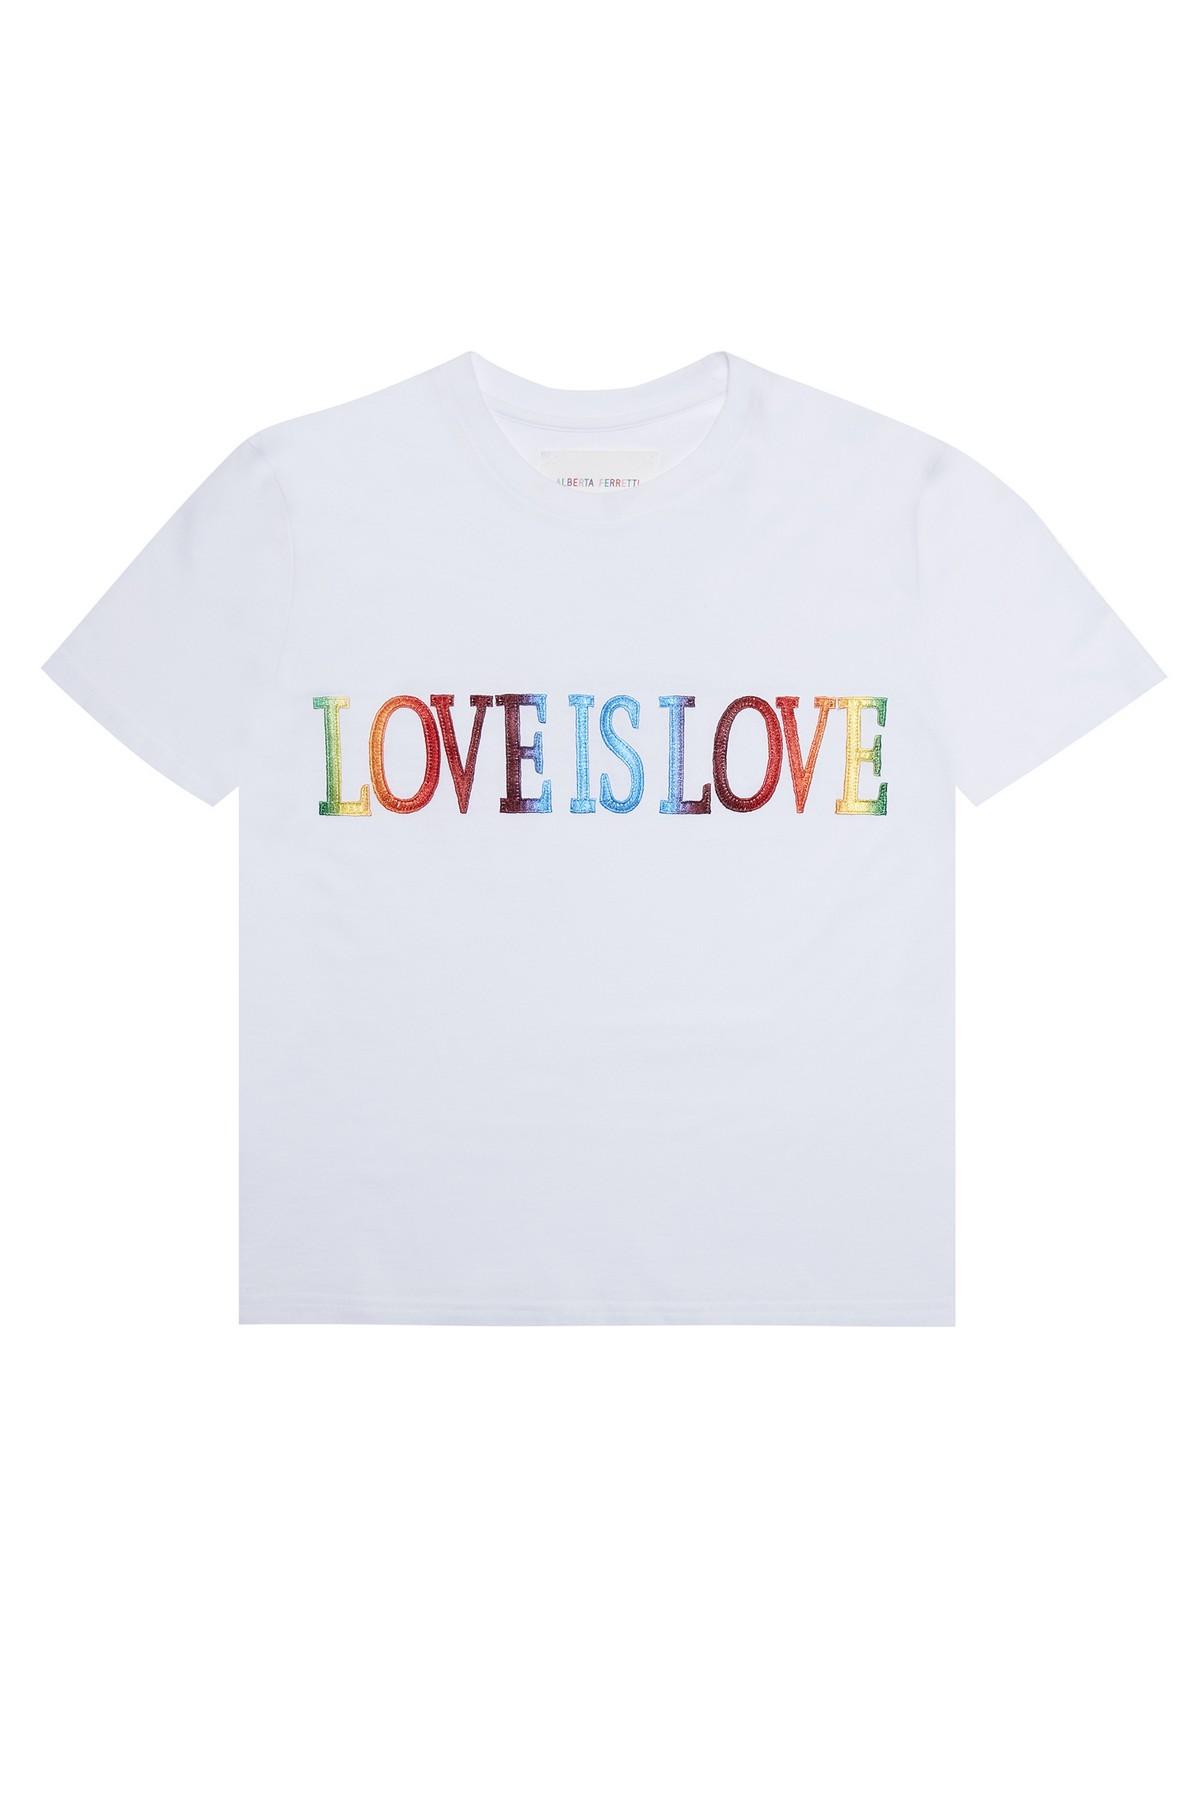 Alberta Ferretti Love is Love